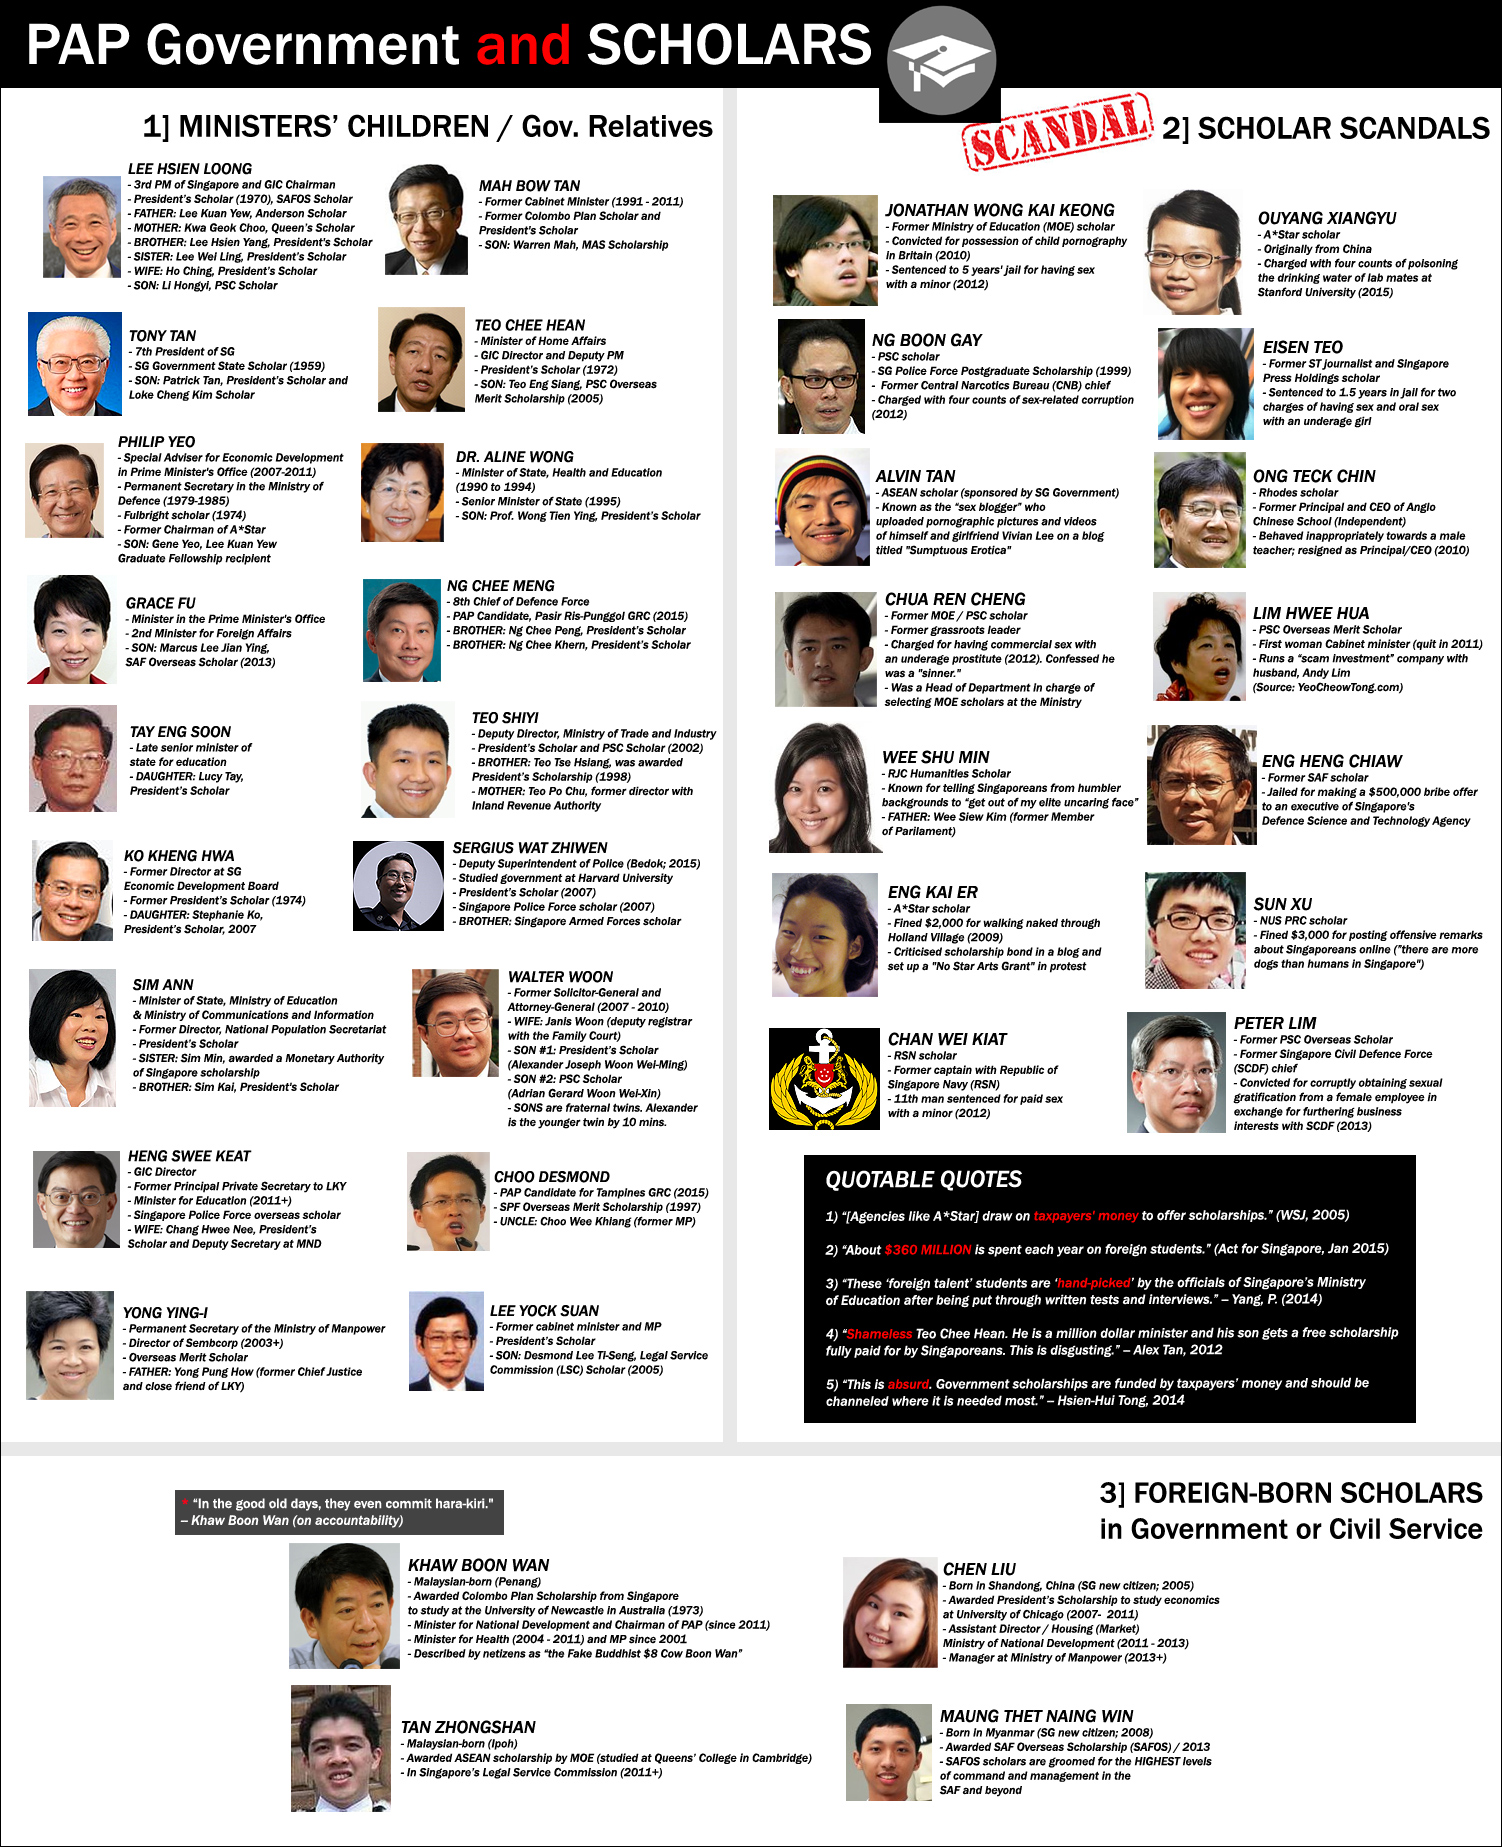 50 Tons Mais Escuros Download Torrent magic now philippines - مطالب فروردین 1396